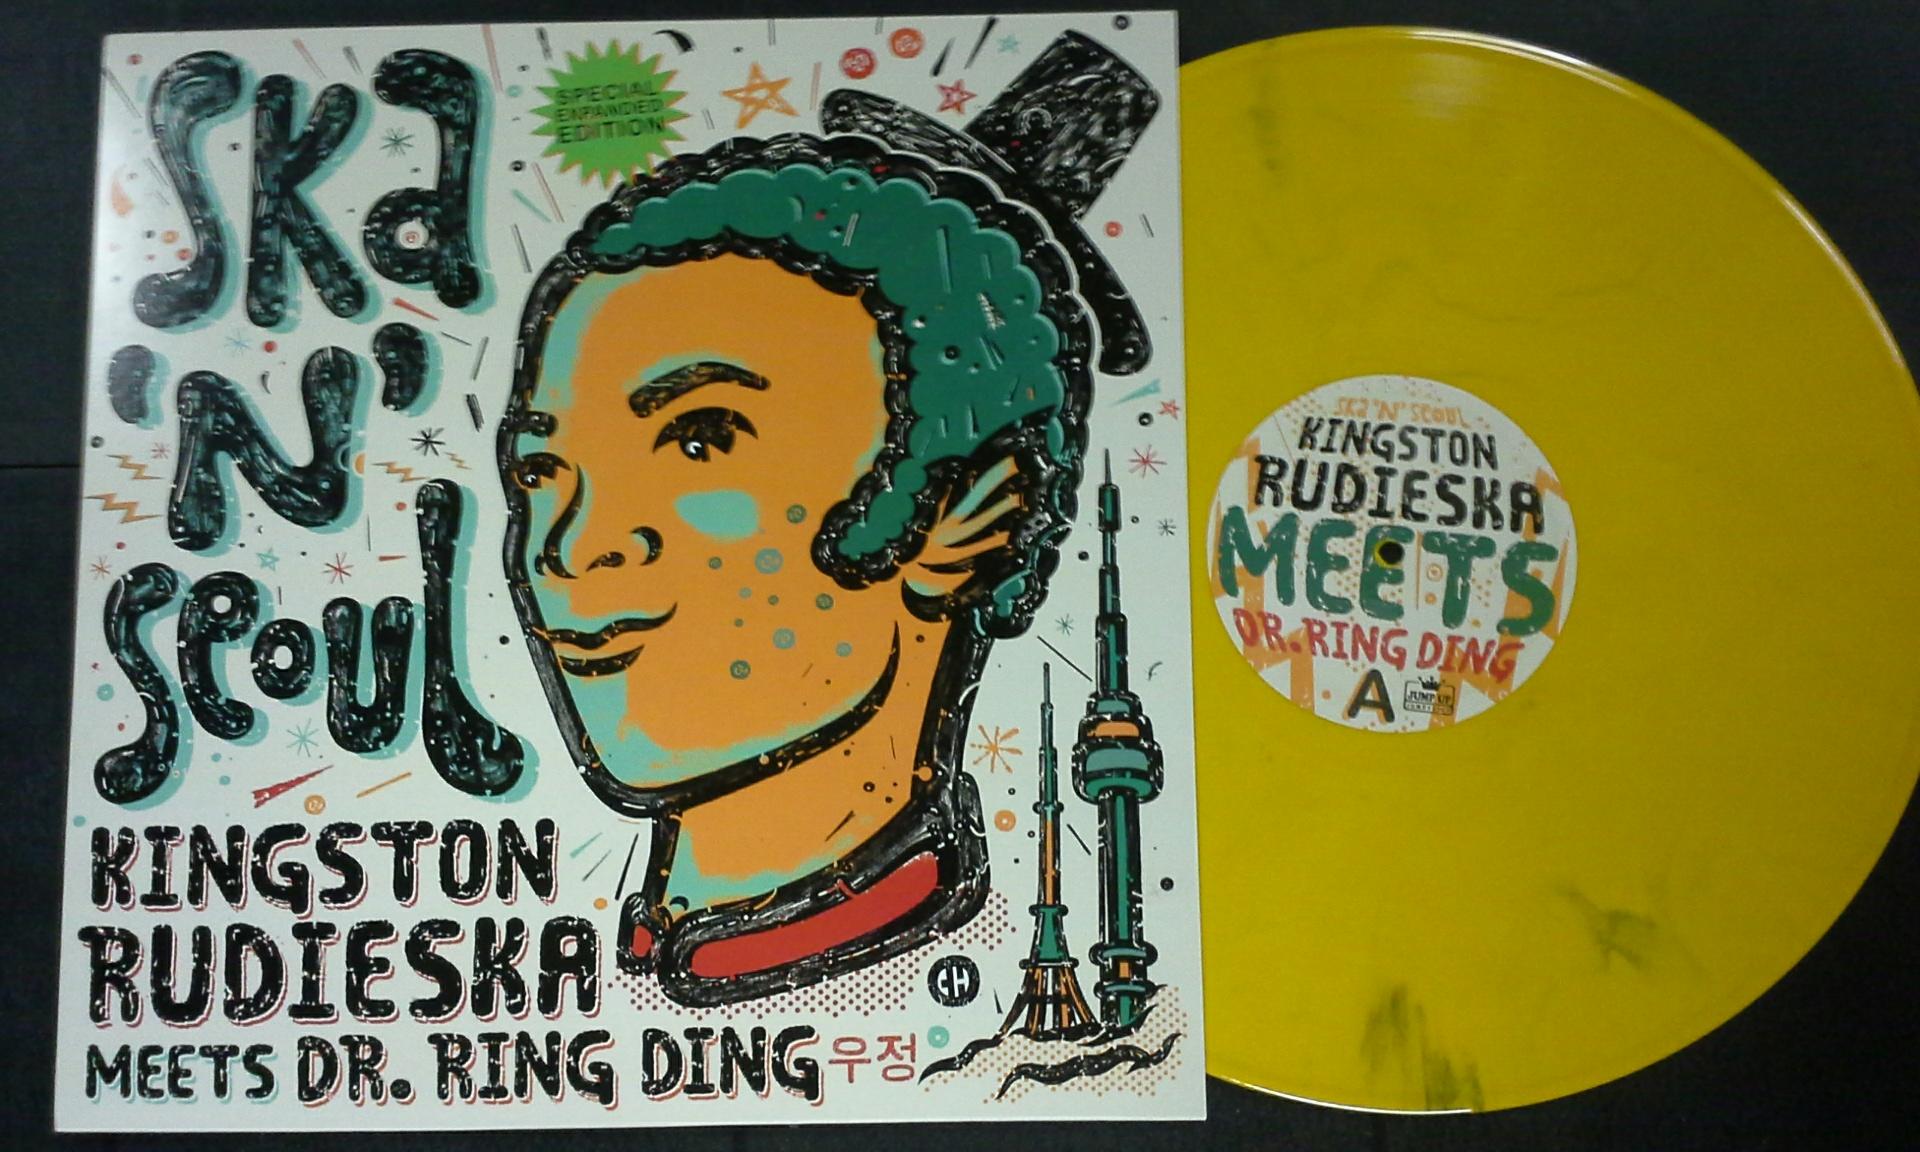 Kingston Rudieska & Dr Ring Ding/SKA LP